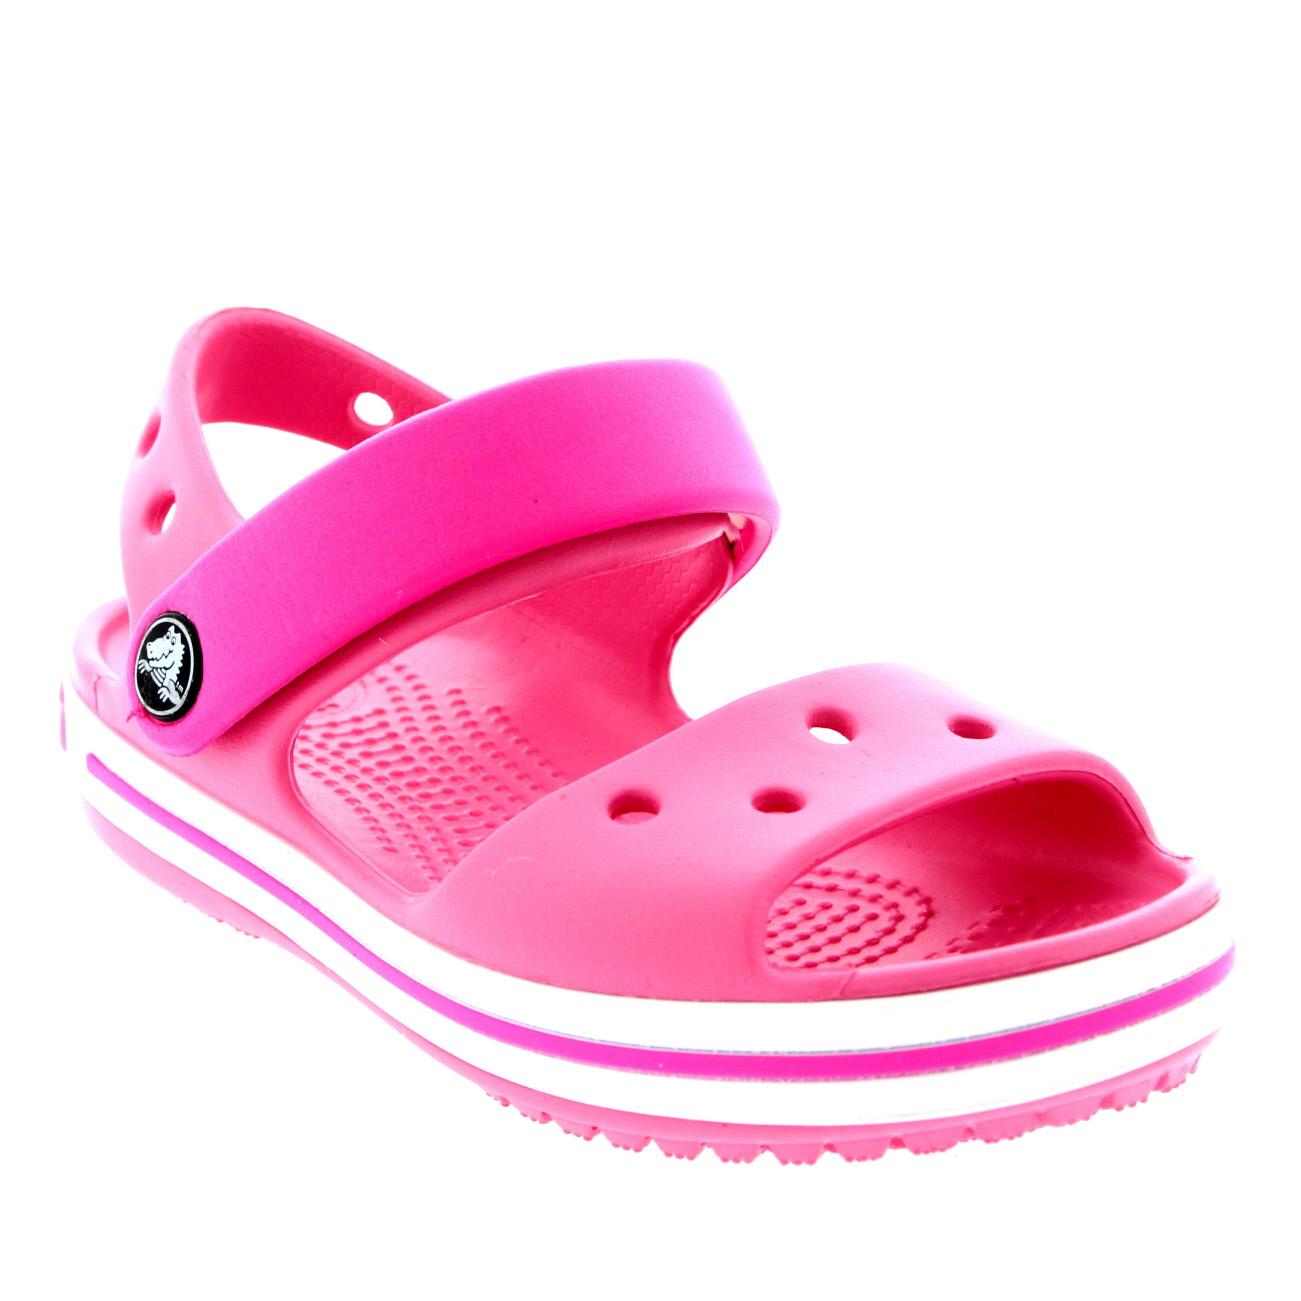 Unisex Kids Crocs Crocband Sandal